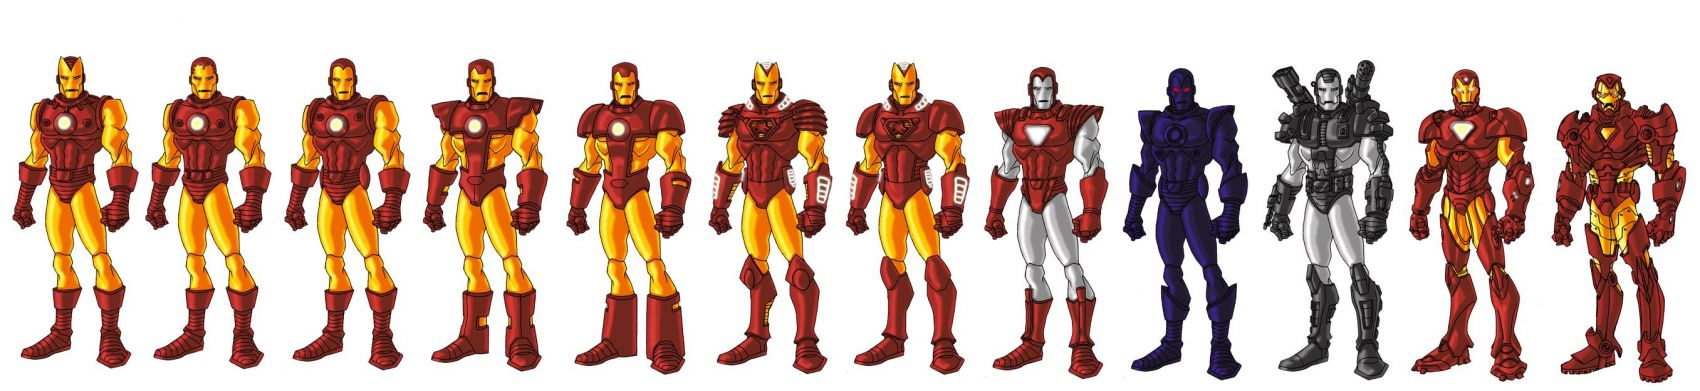 ironman3.jpg